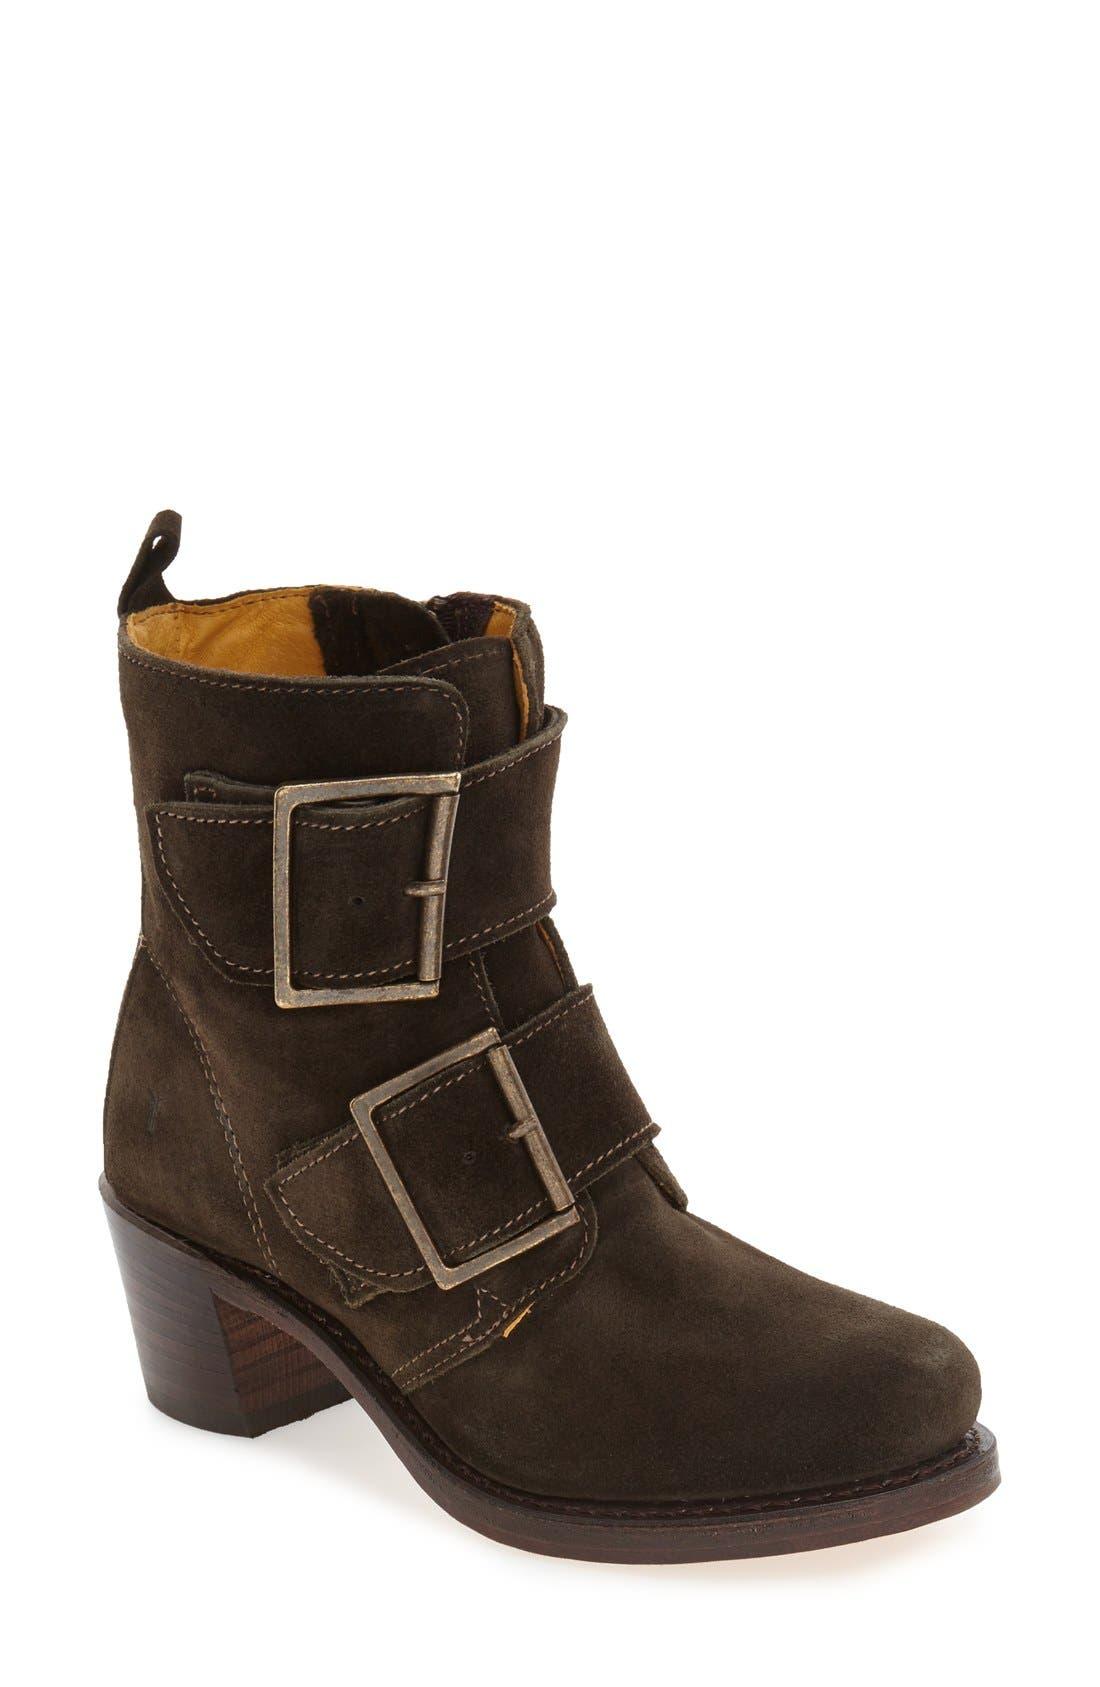 Alternate Image 1 Selected - Frye 'Sabrina' Double Buckle Boot (Women)